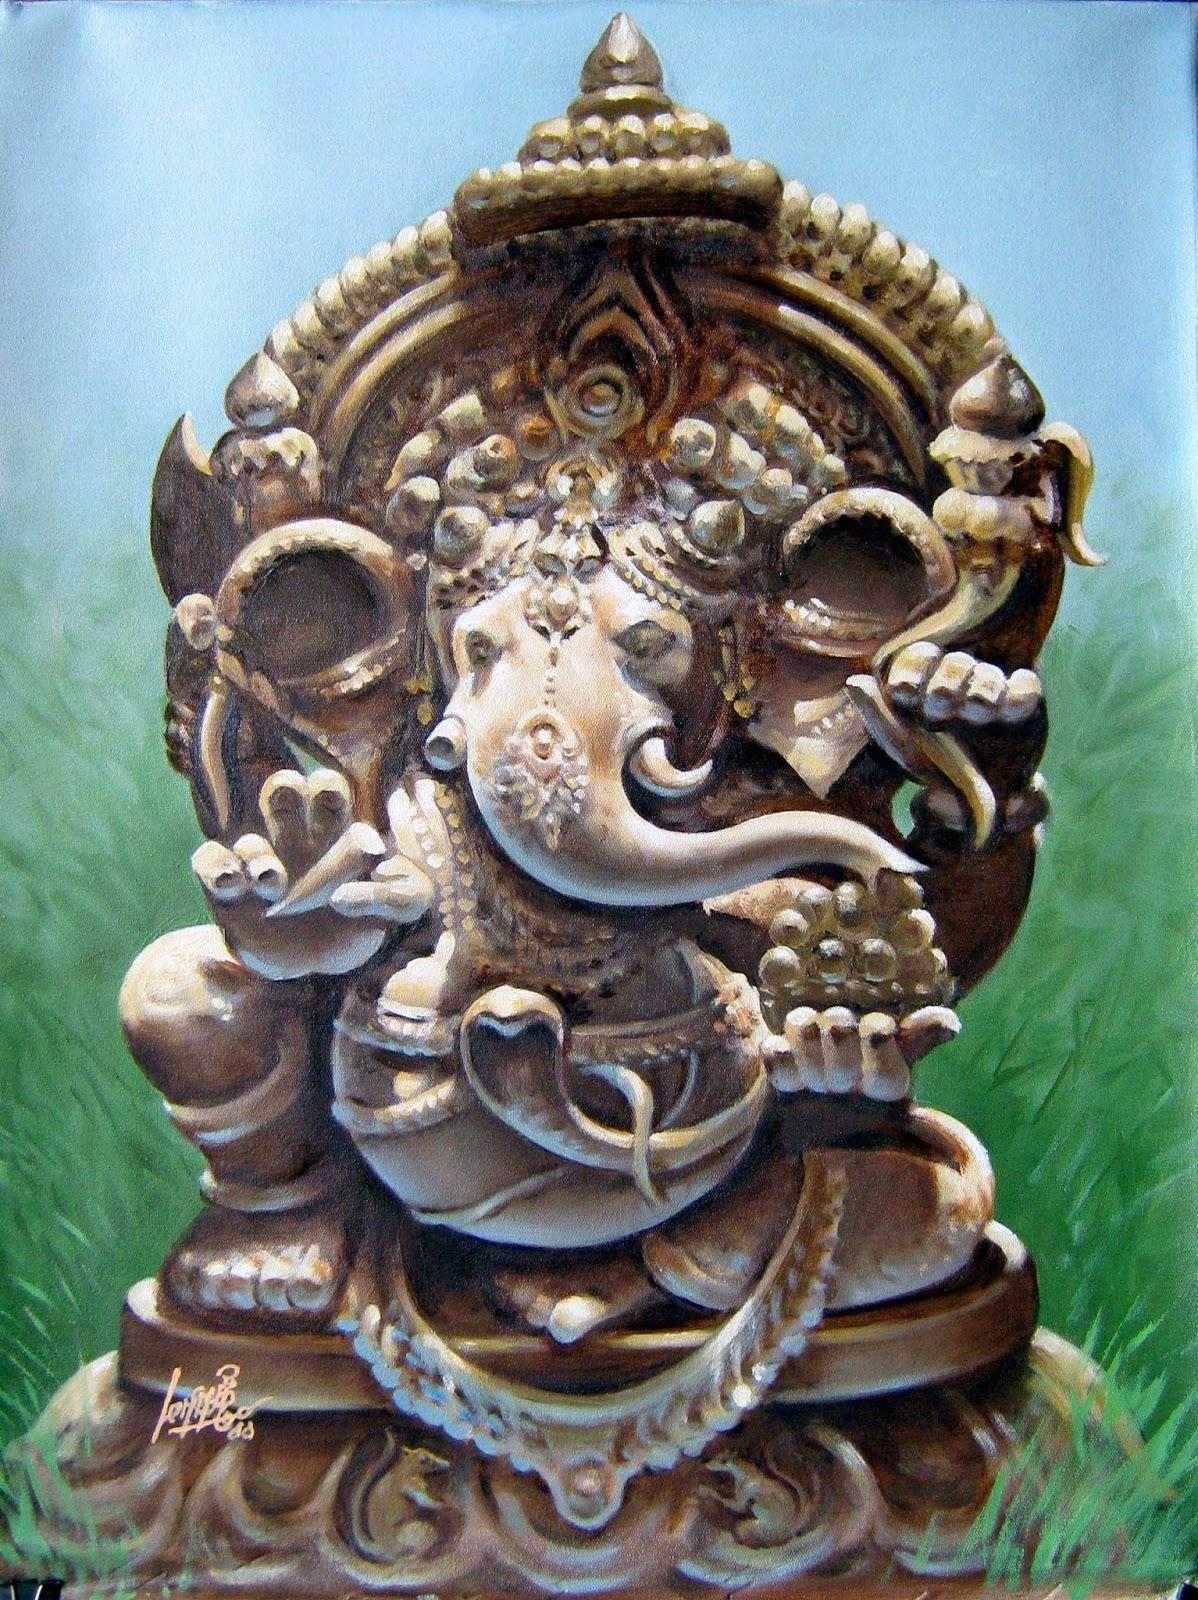 Oviyar Maruthi: Oil Painting - Lord Ganesha